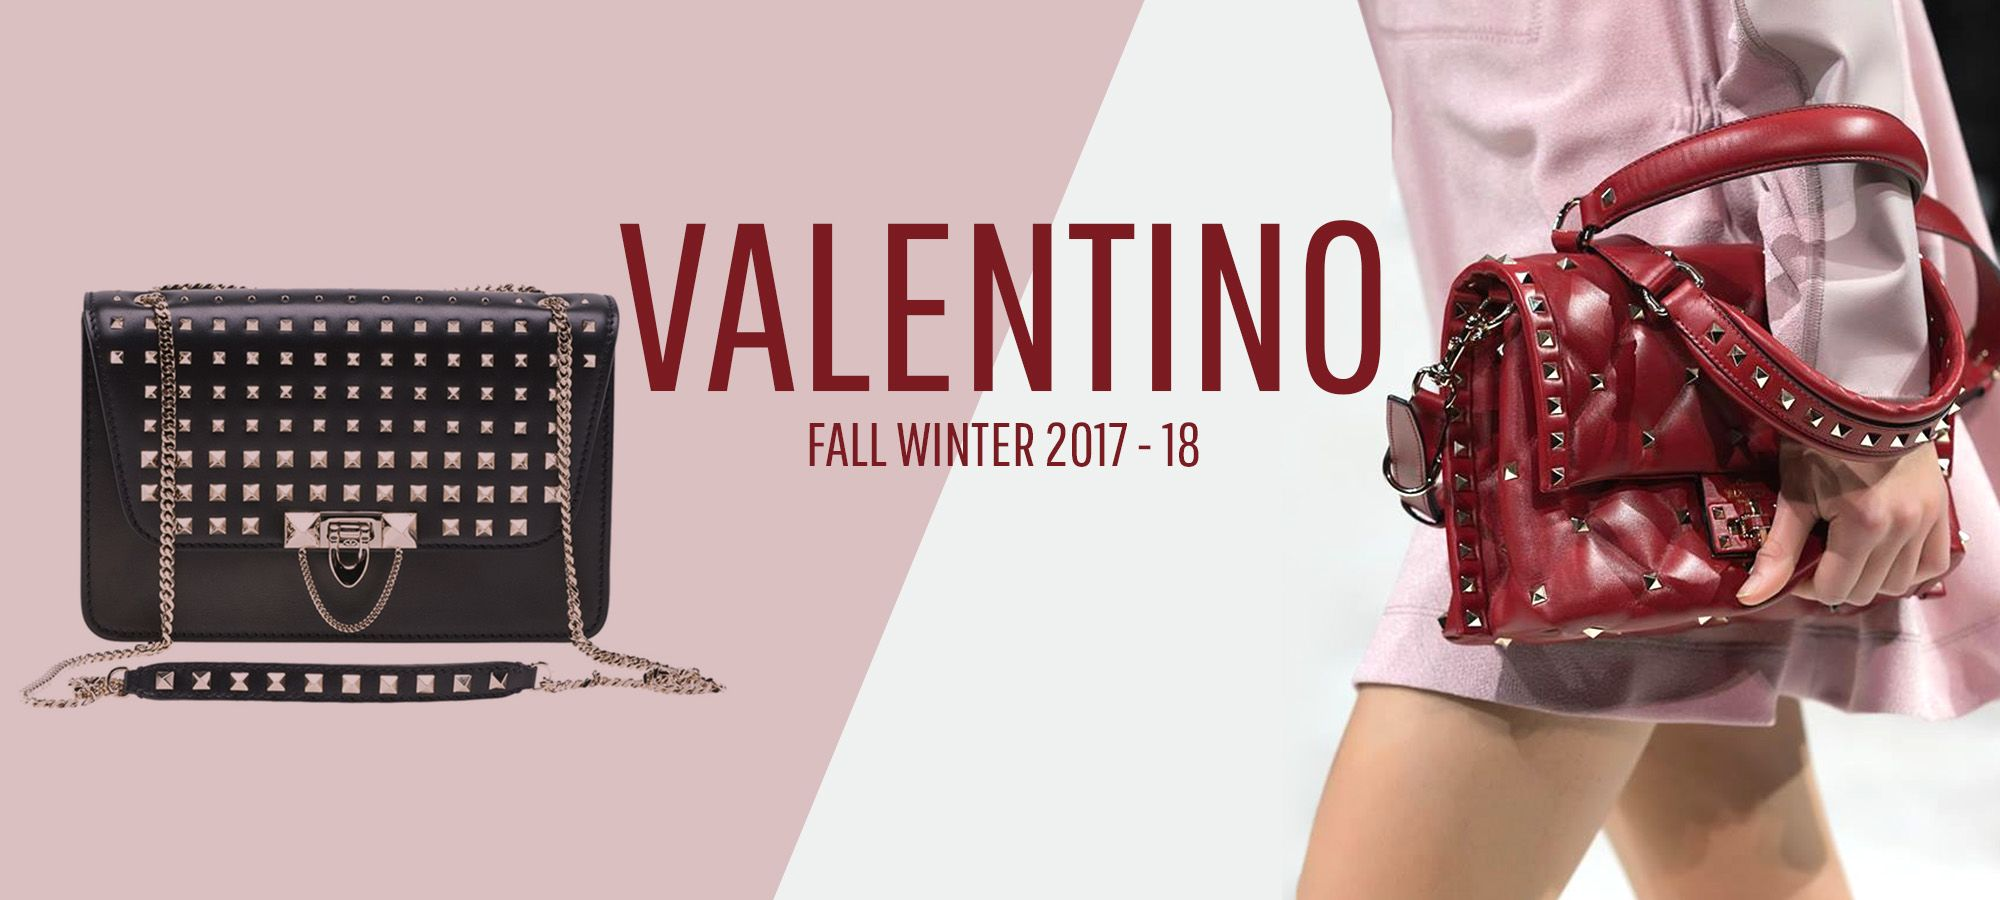 Valentino Women - Fall Winter 2017